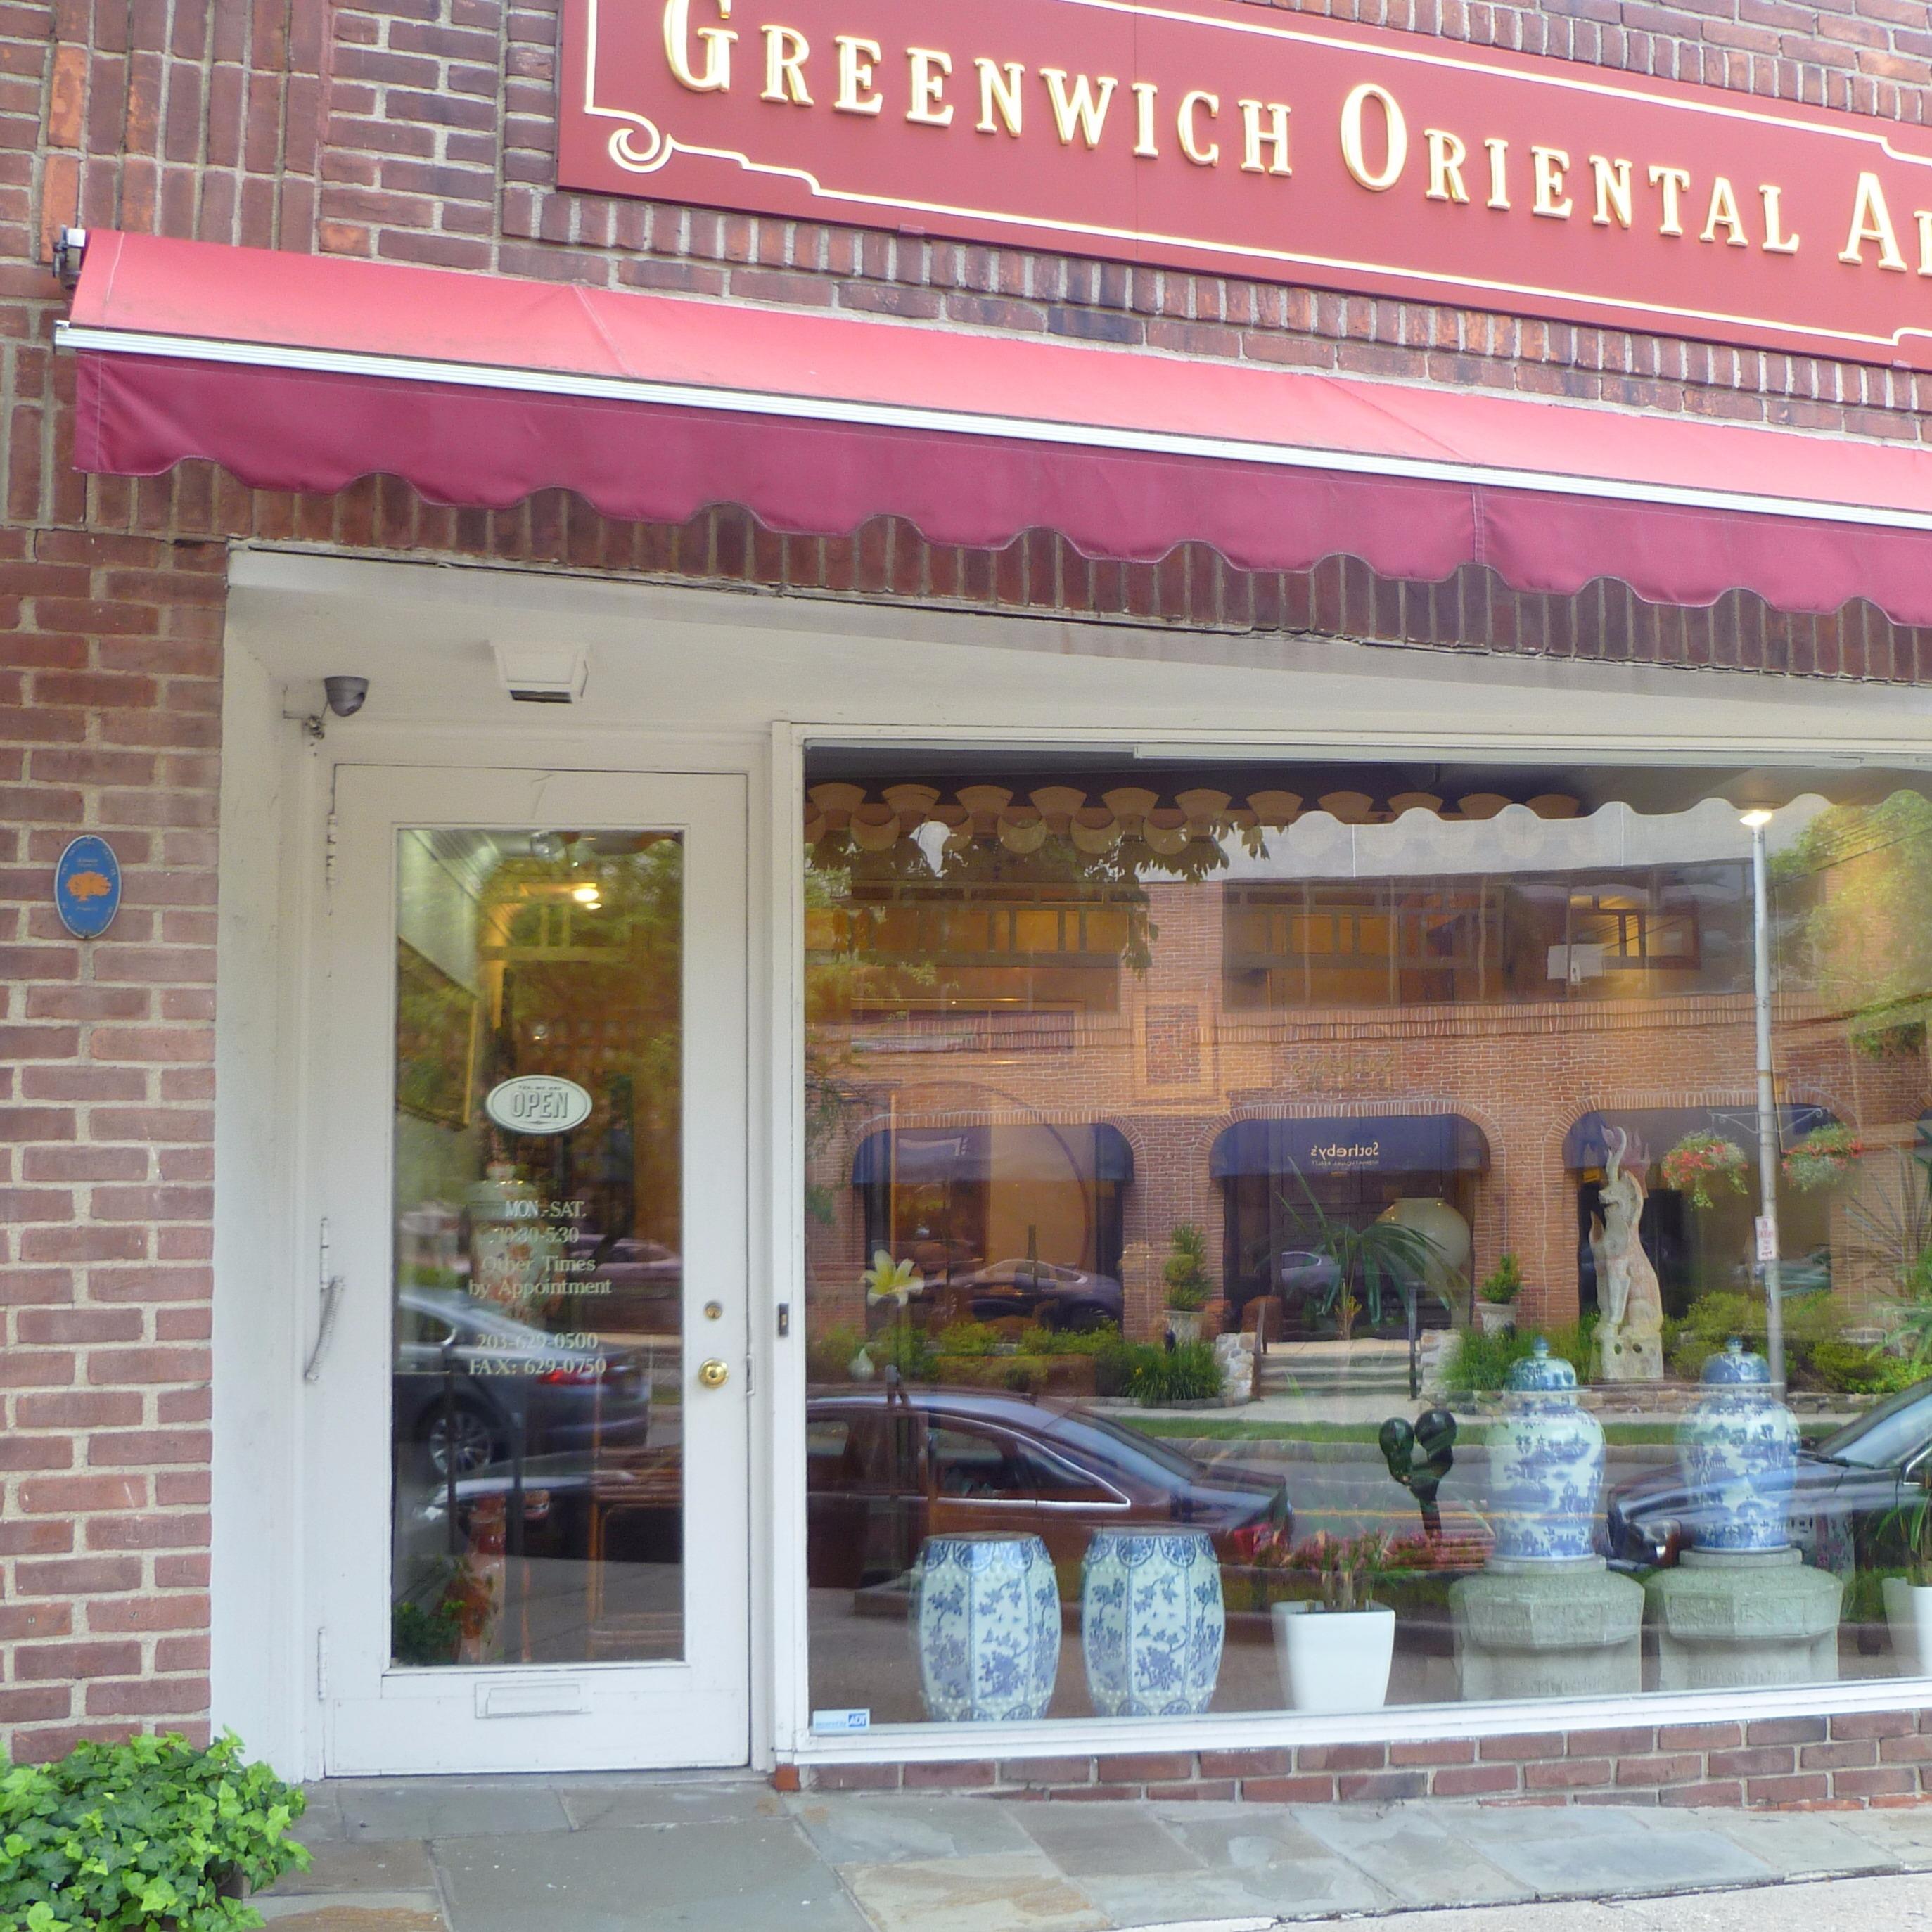 Greenwich Oriental Antiques